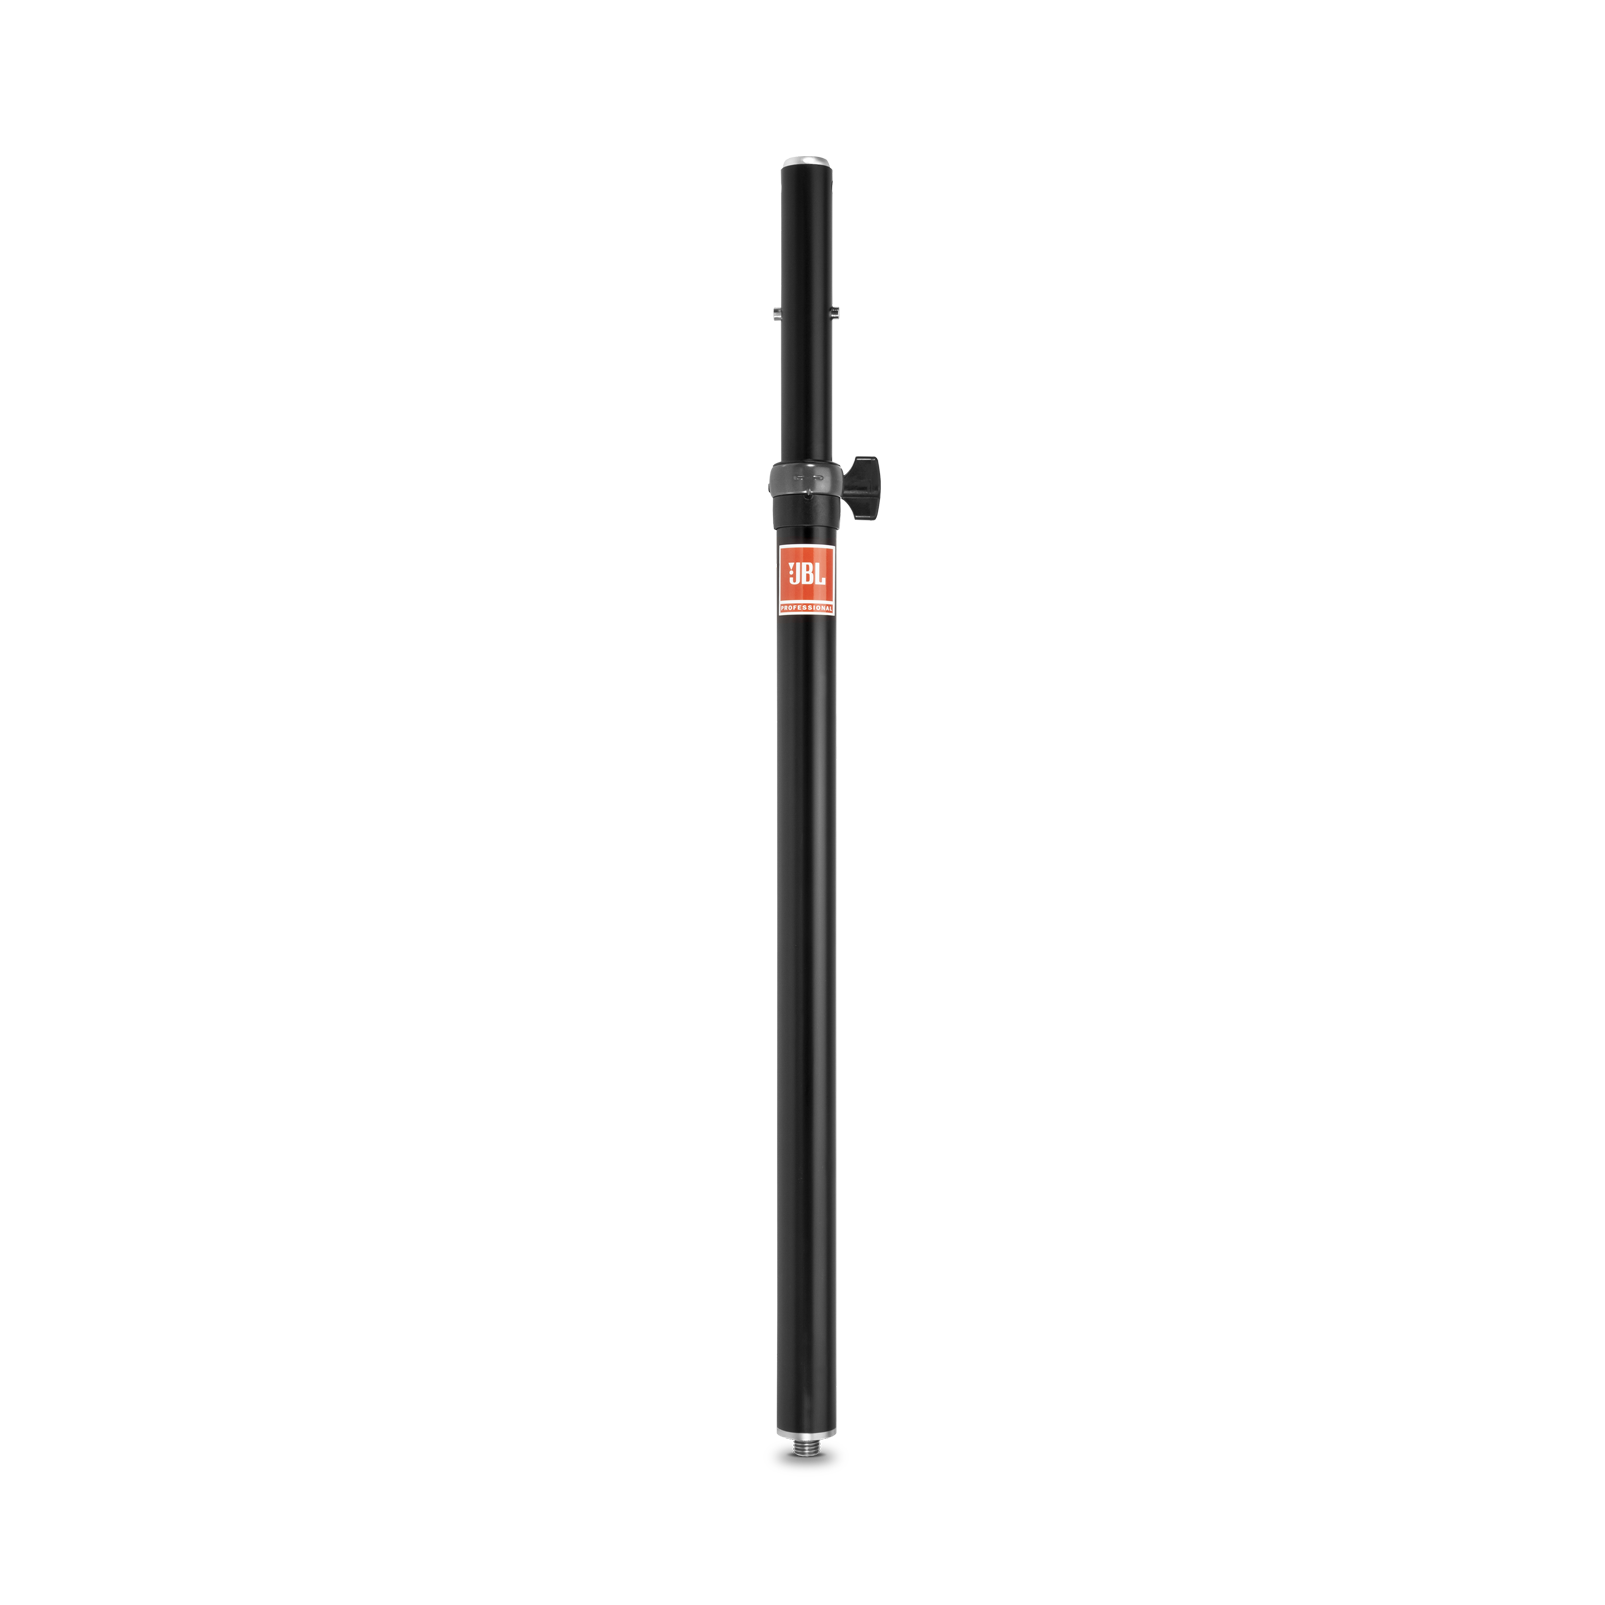 JBL Speaker Pole (Manual Assist) - Black - Manual Adjust Speaker Pole with M20 Threaded Lower End, 38mm Pole & 35mm Adapter - Hero